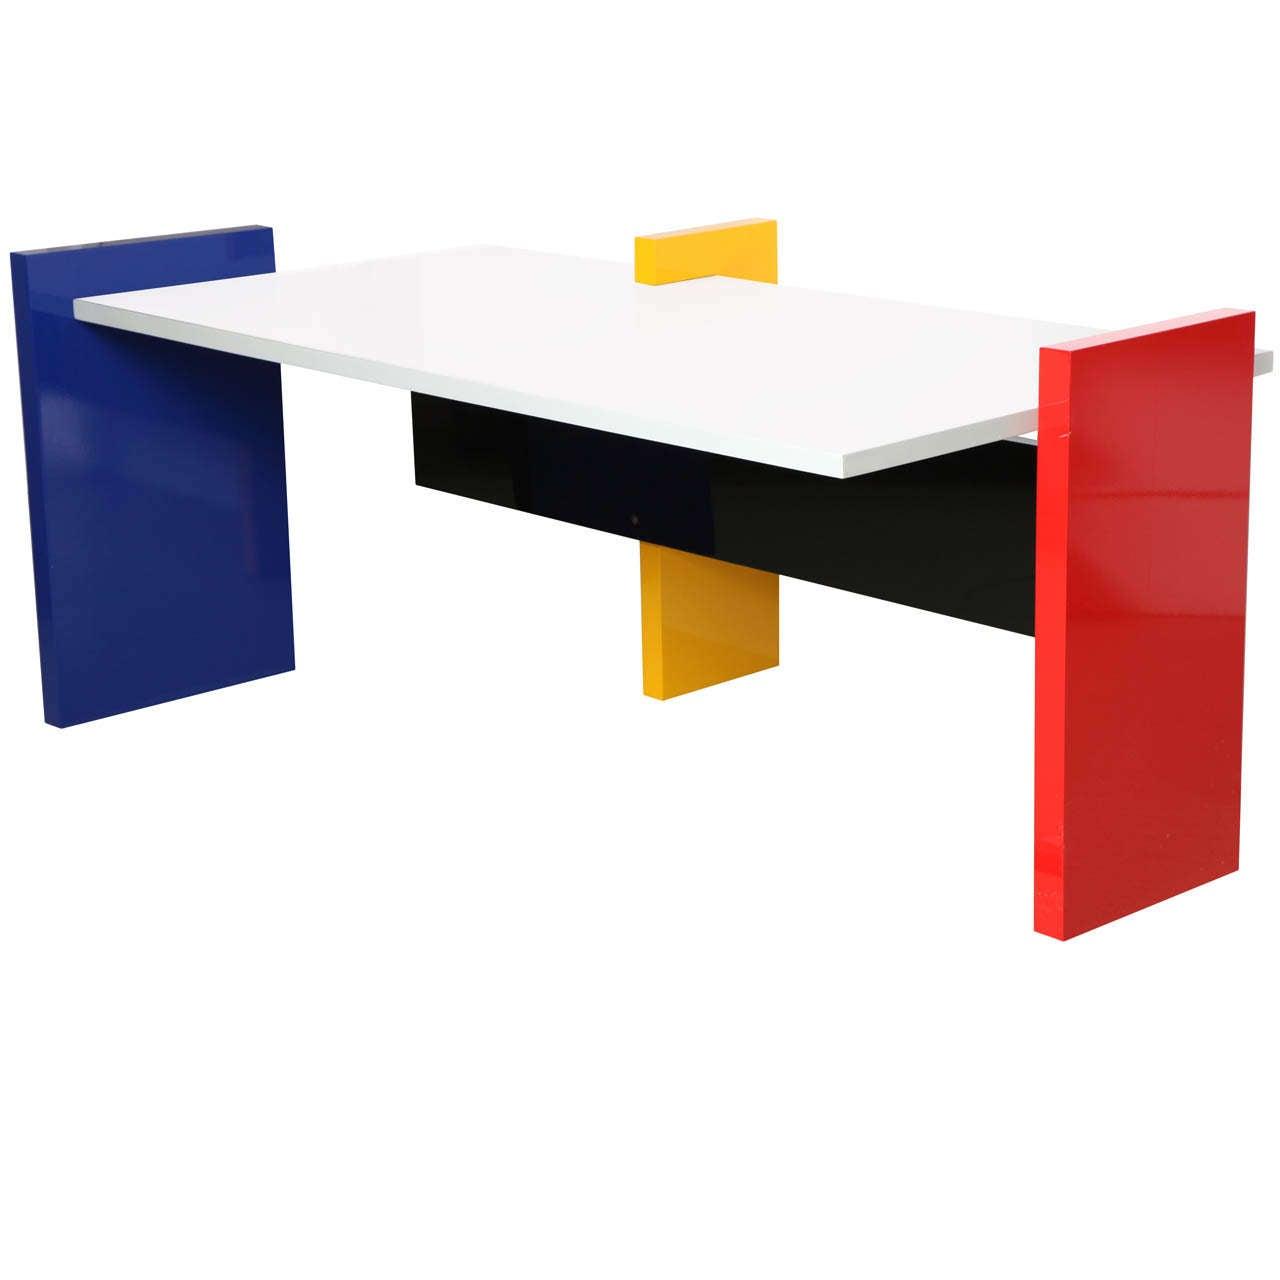 Hommage A Mondrian Desk By Danilo Silvestrin At 1stdibs